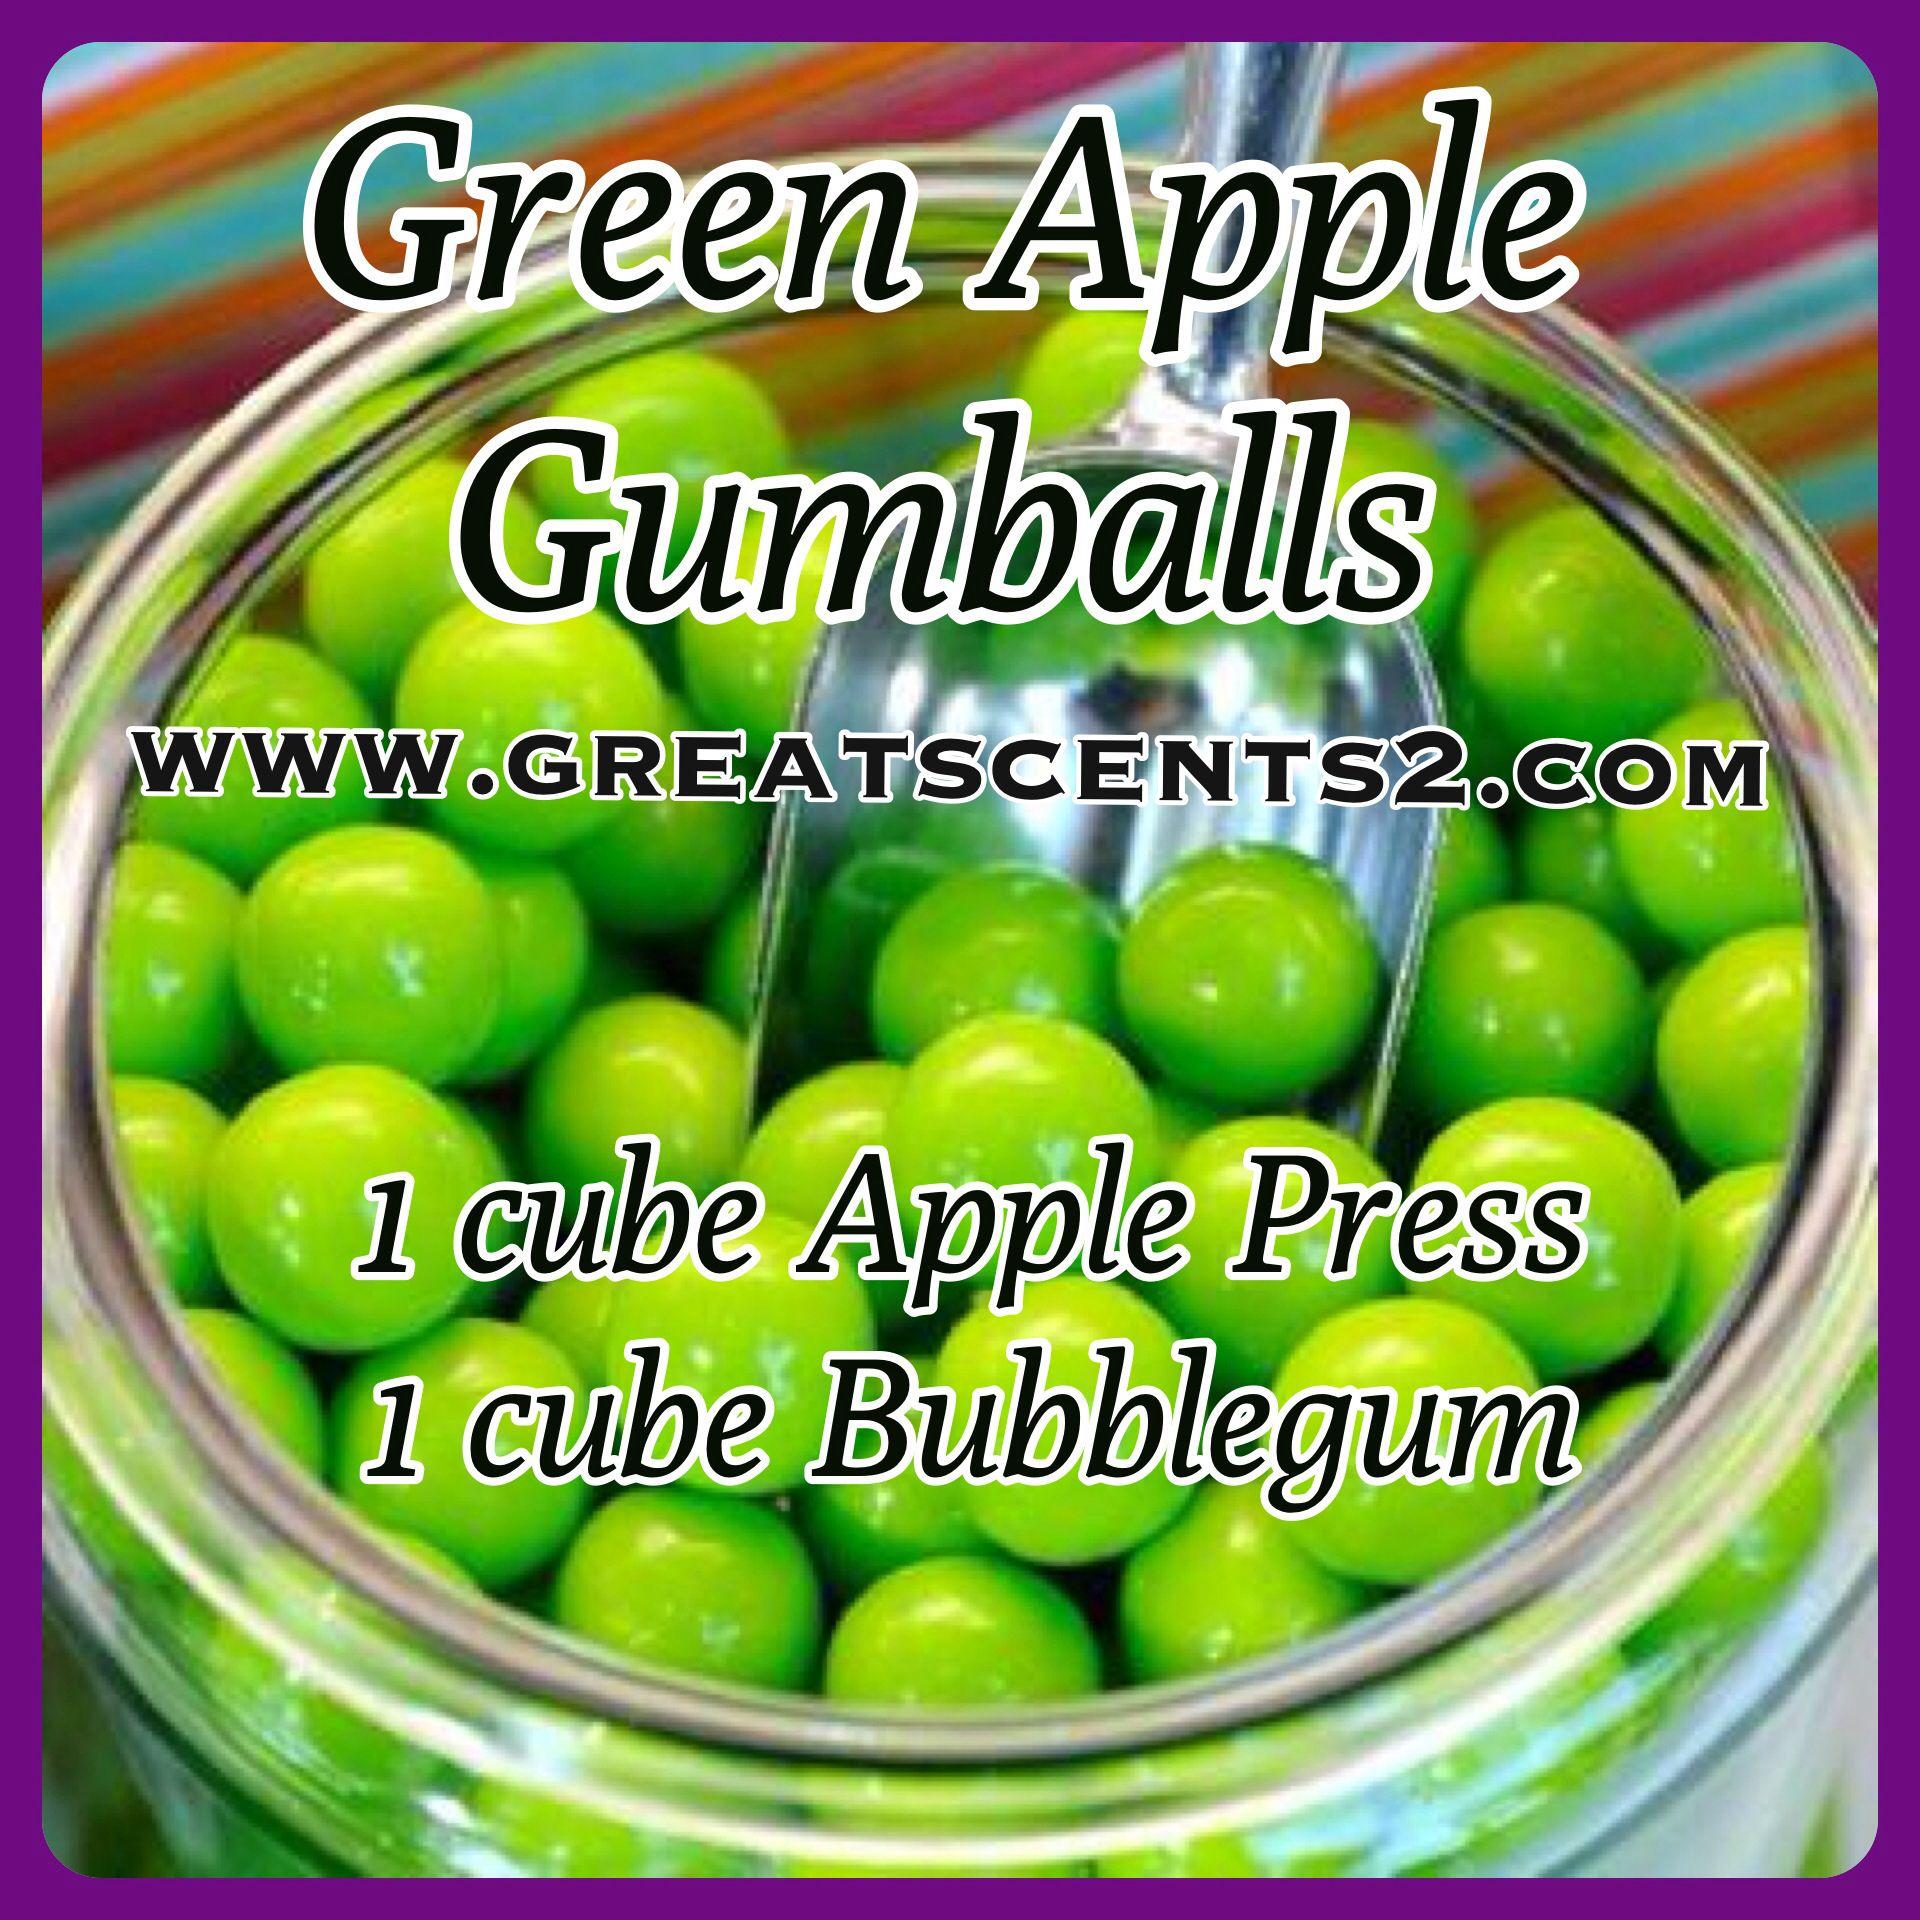 Green Apple Gumballs Scentsy Recipe